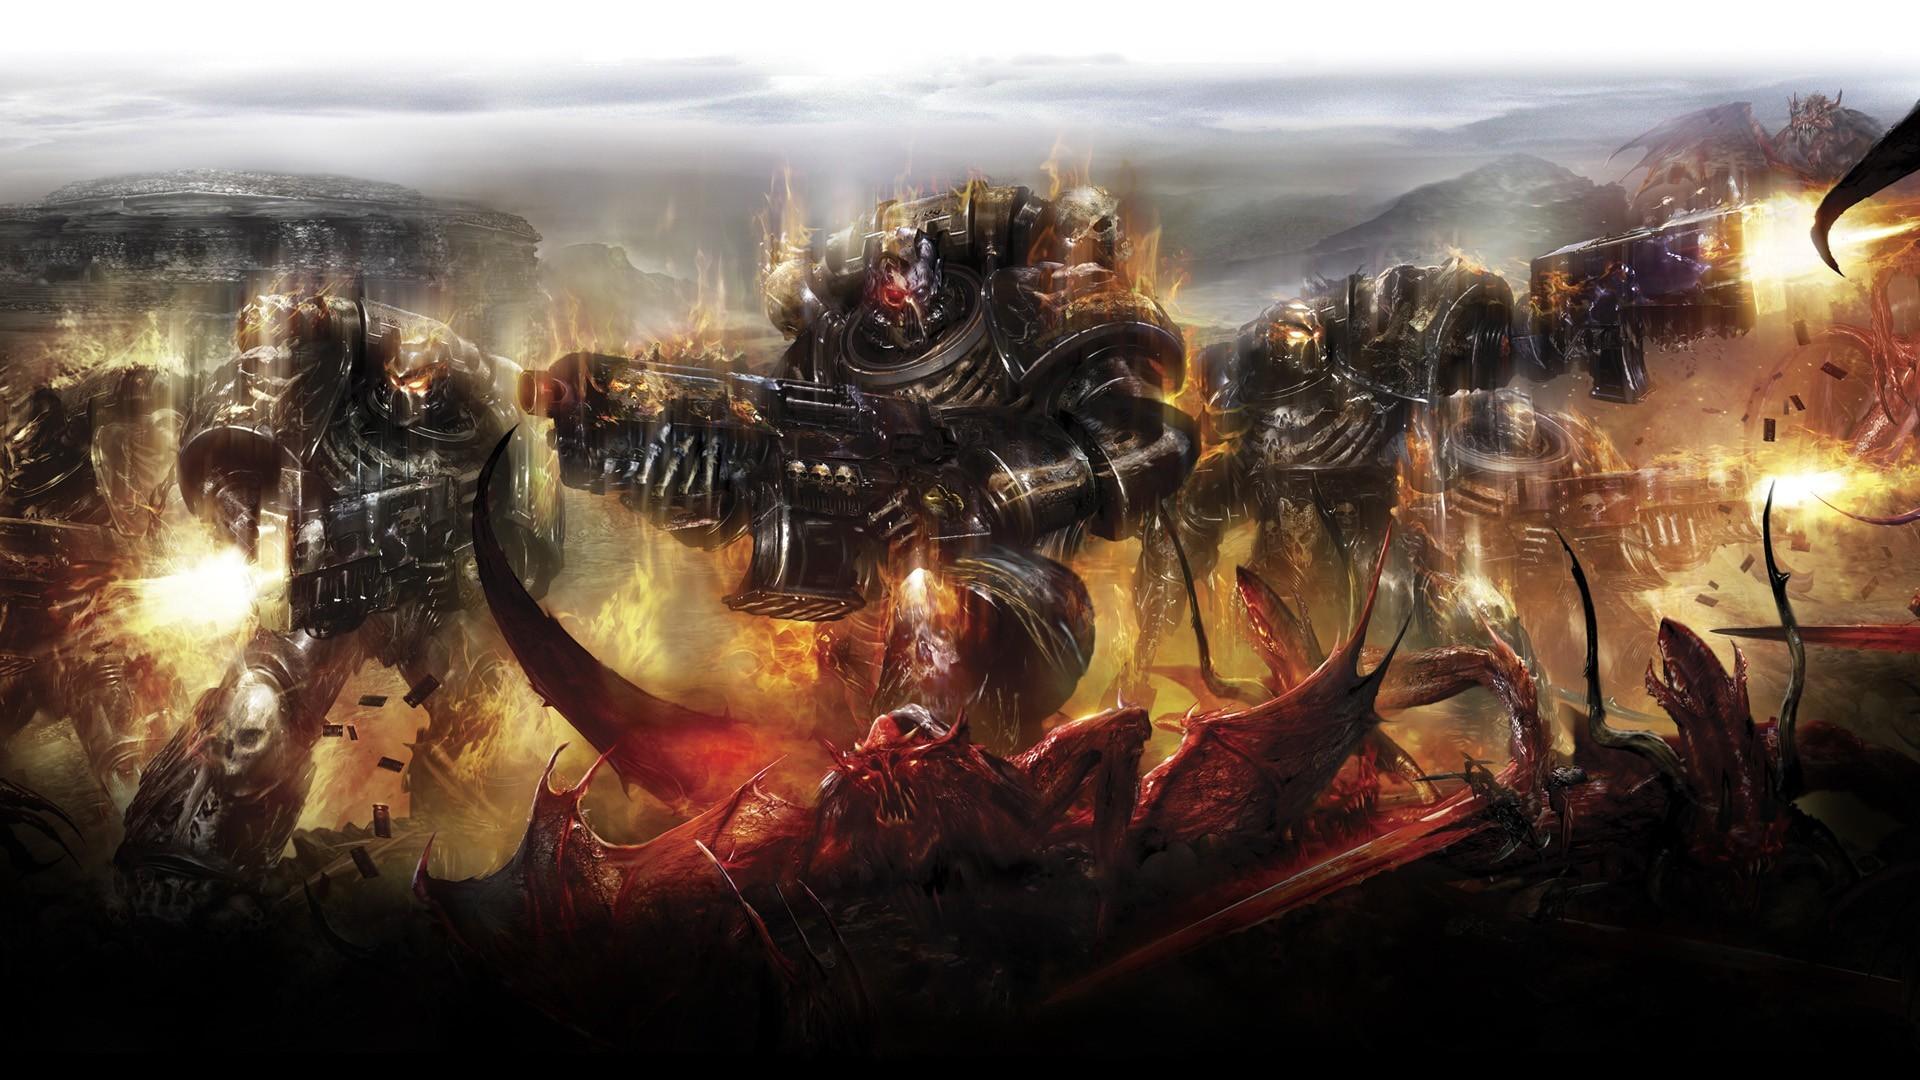 Warhammer 40K Wallpaper Warhammer, 40K, Chaos, Space, Marine